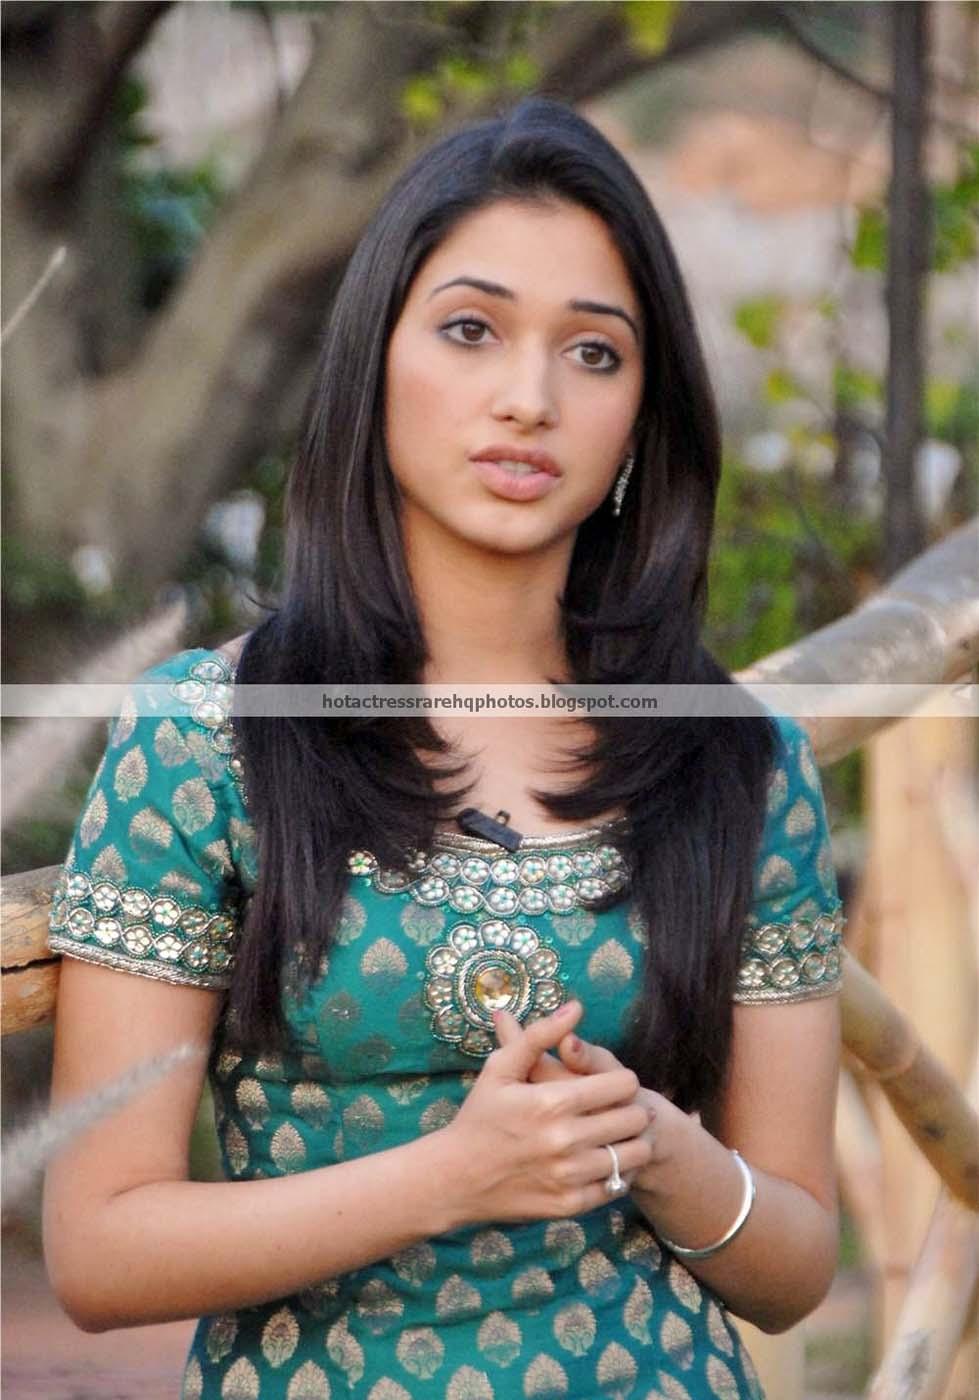 hot-mallu-actress-nayanthara-unseen-hot-photo-album-13